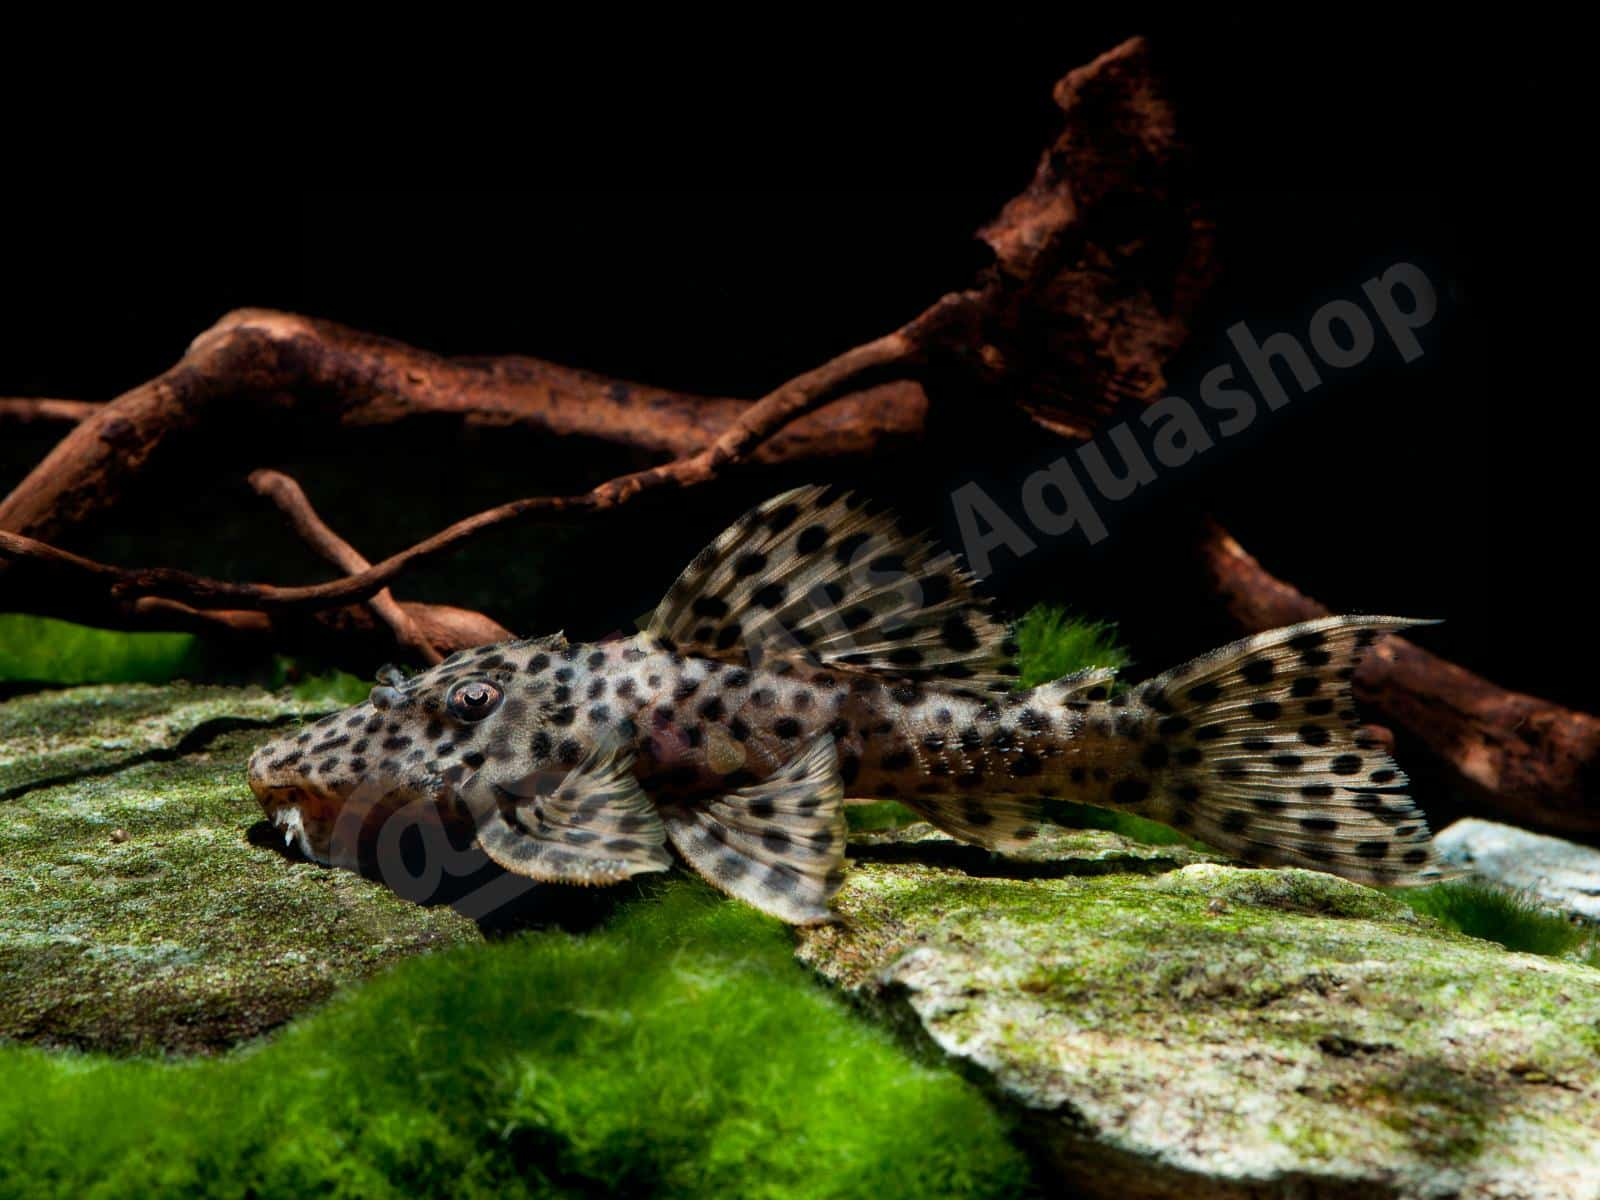 leporacanthicus heterodon enrico richter 0183 7